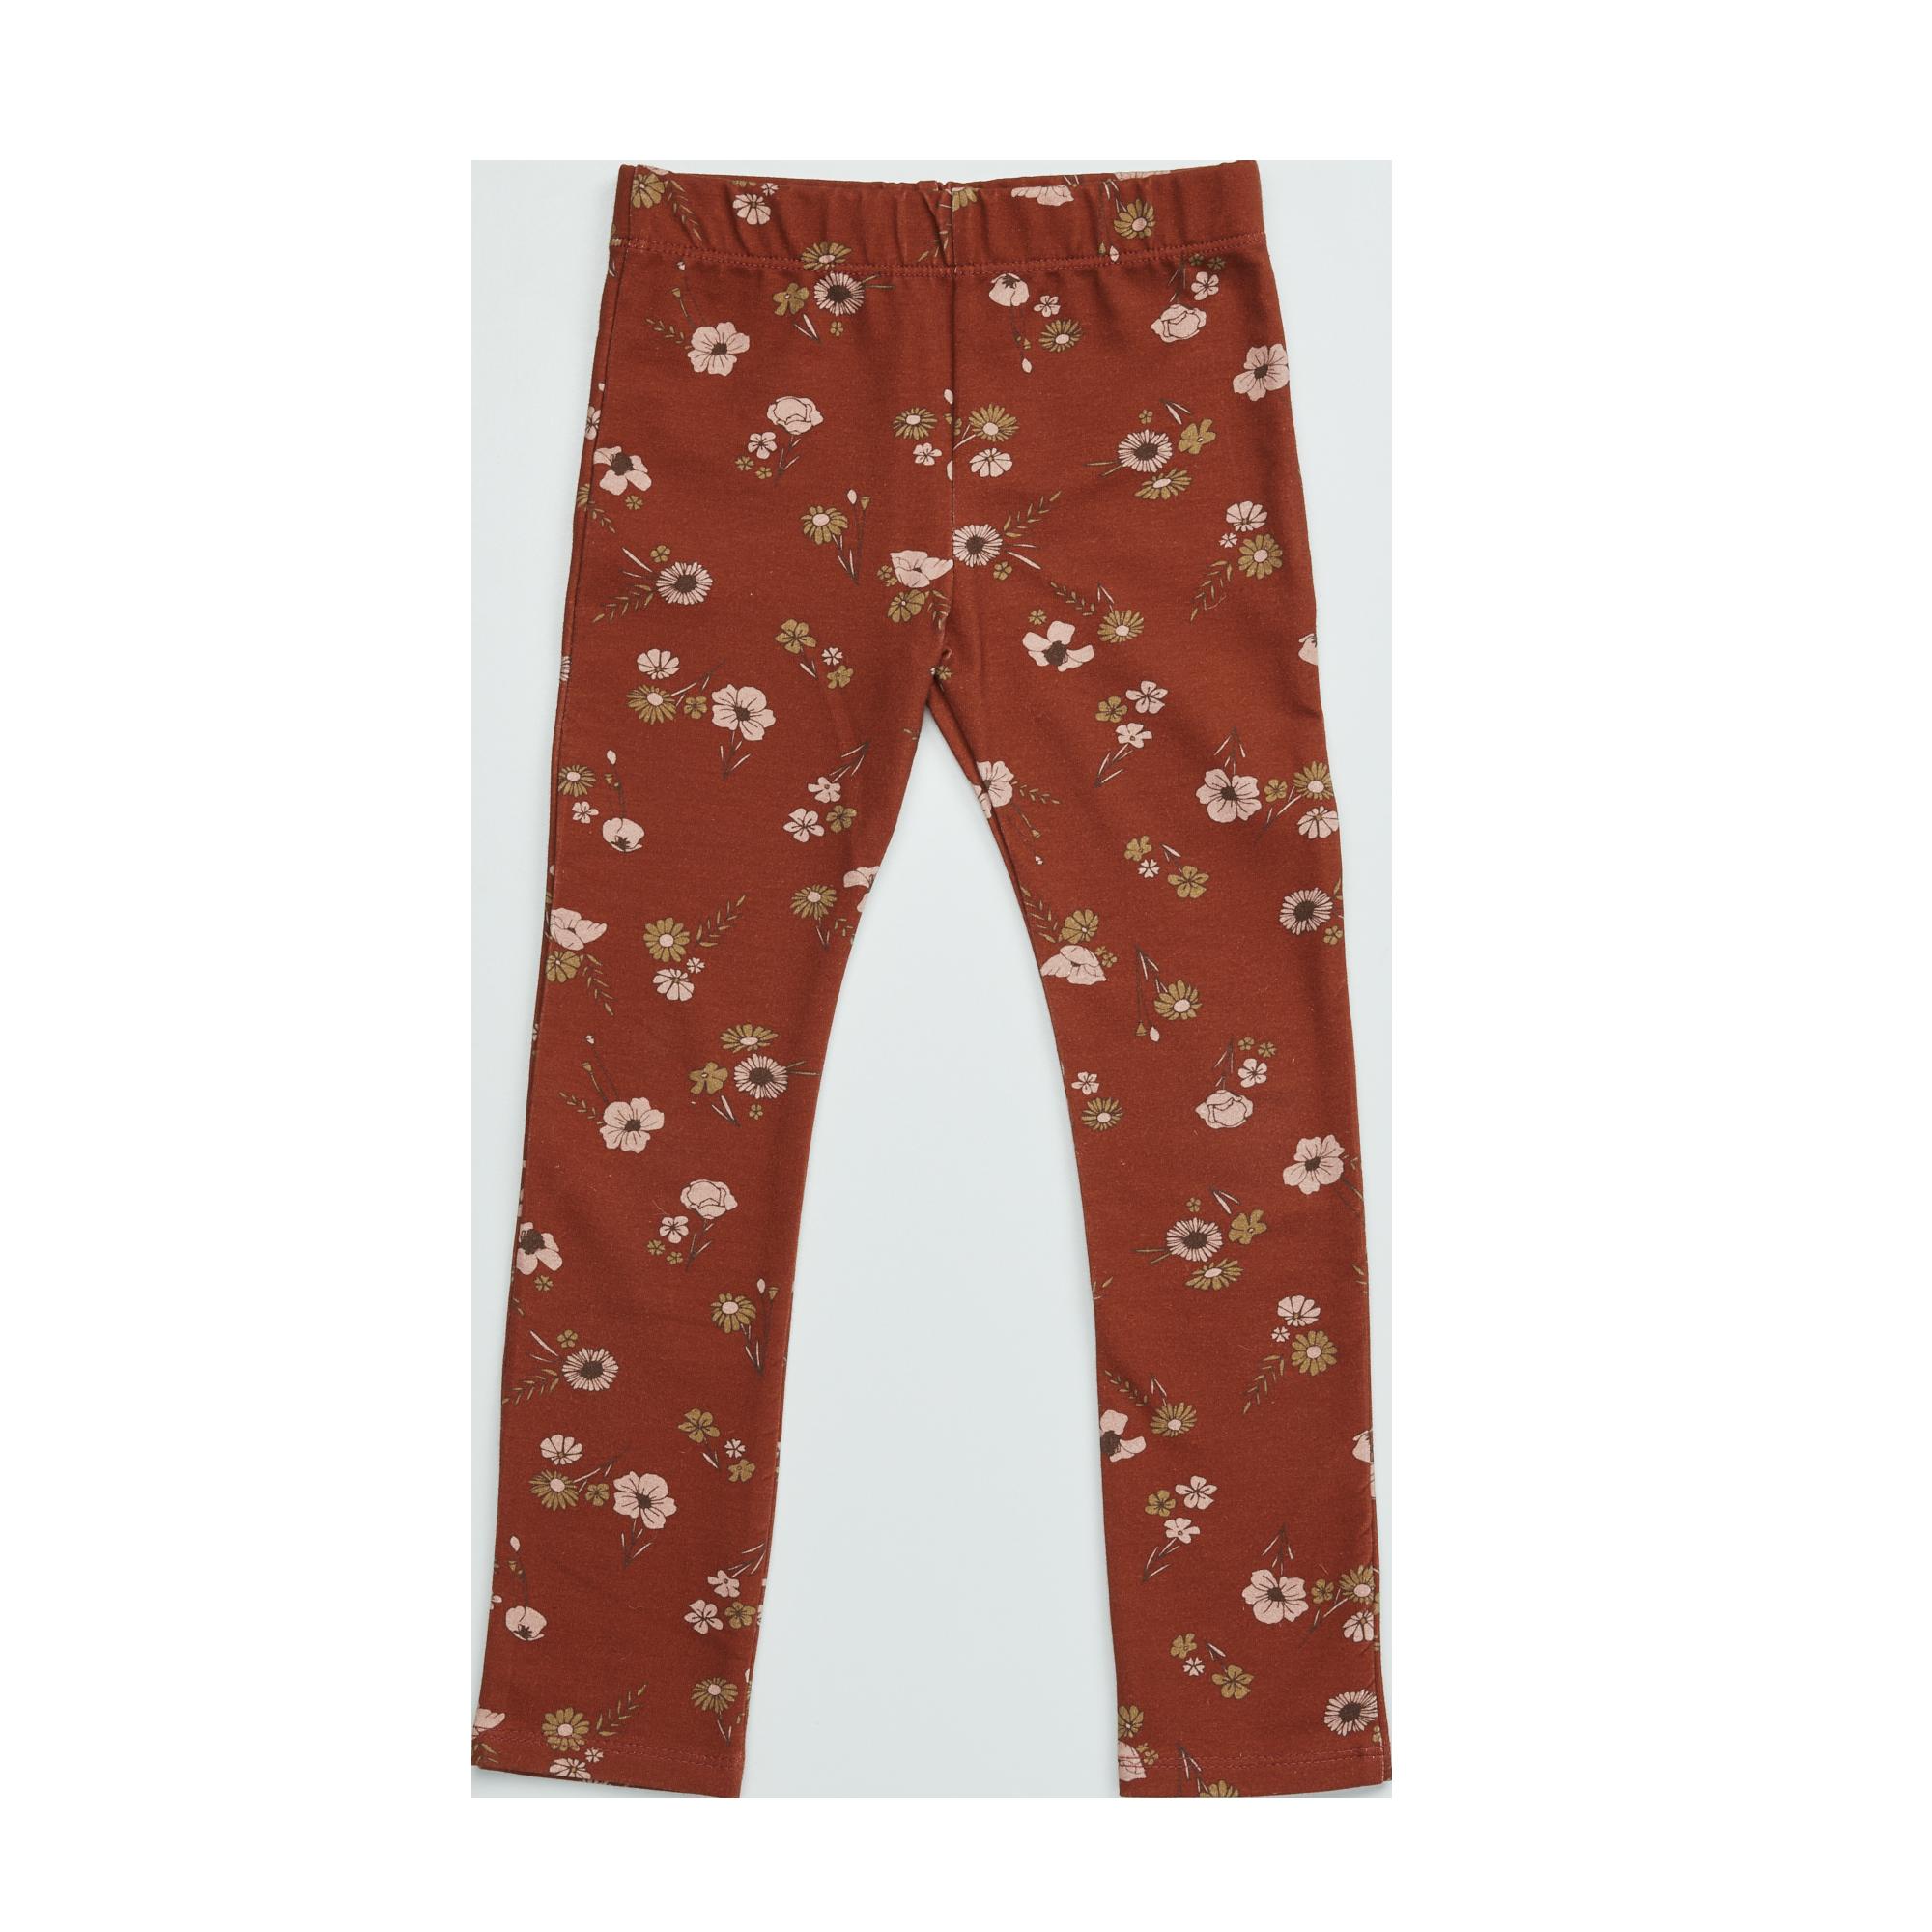 Blossom kids Legging printed, festive floral | dusty terra